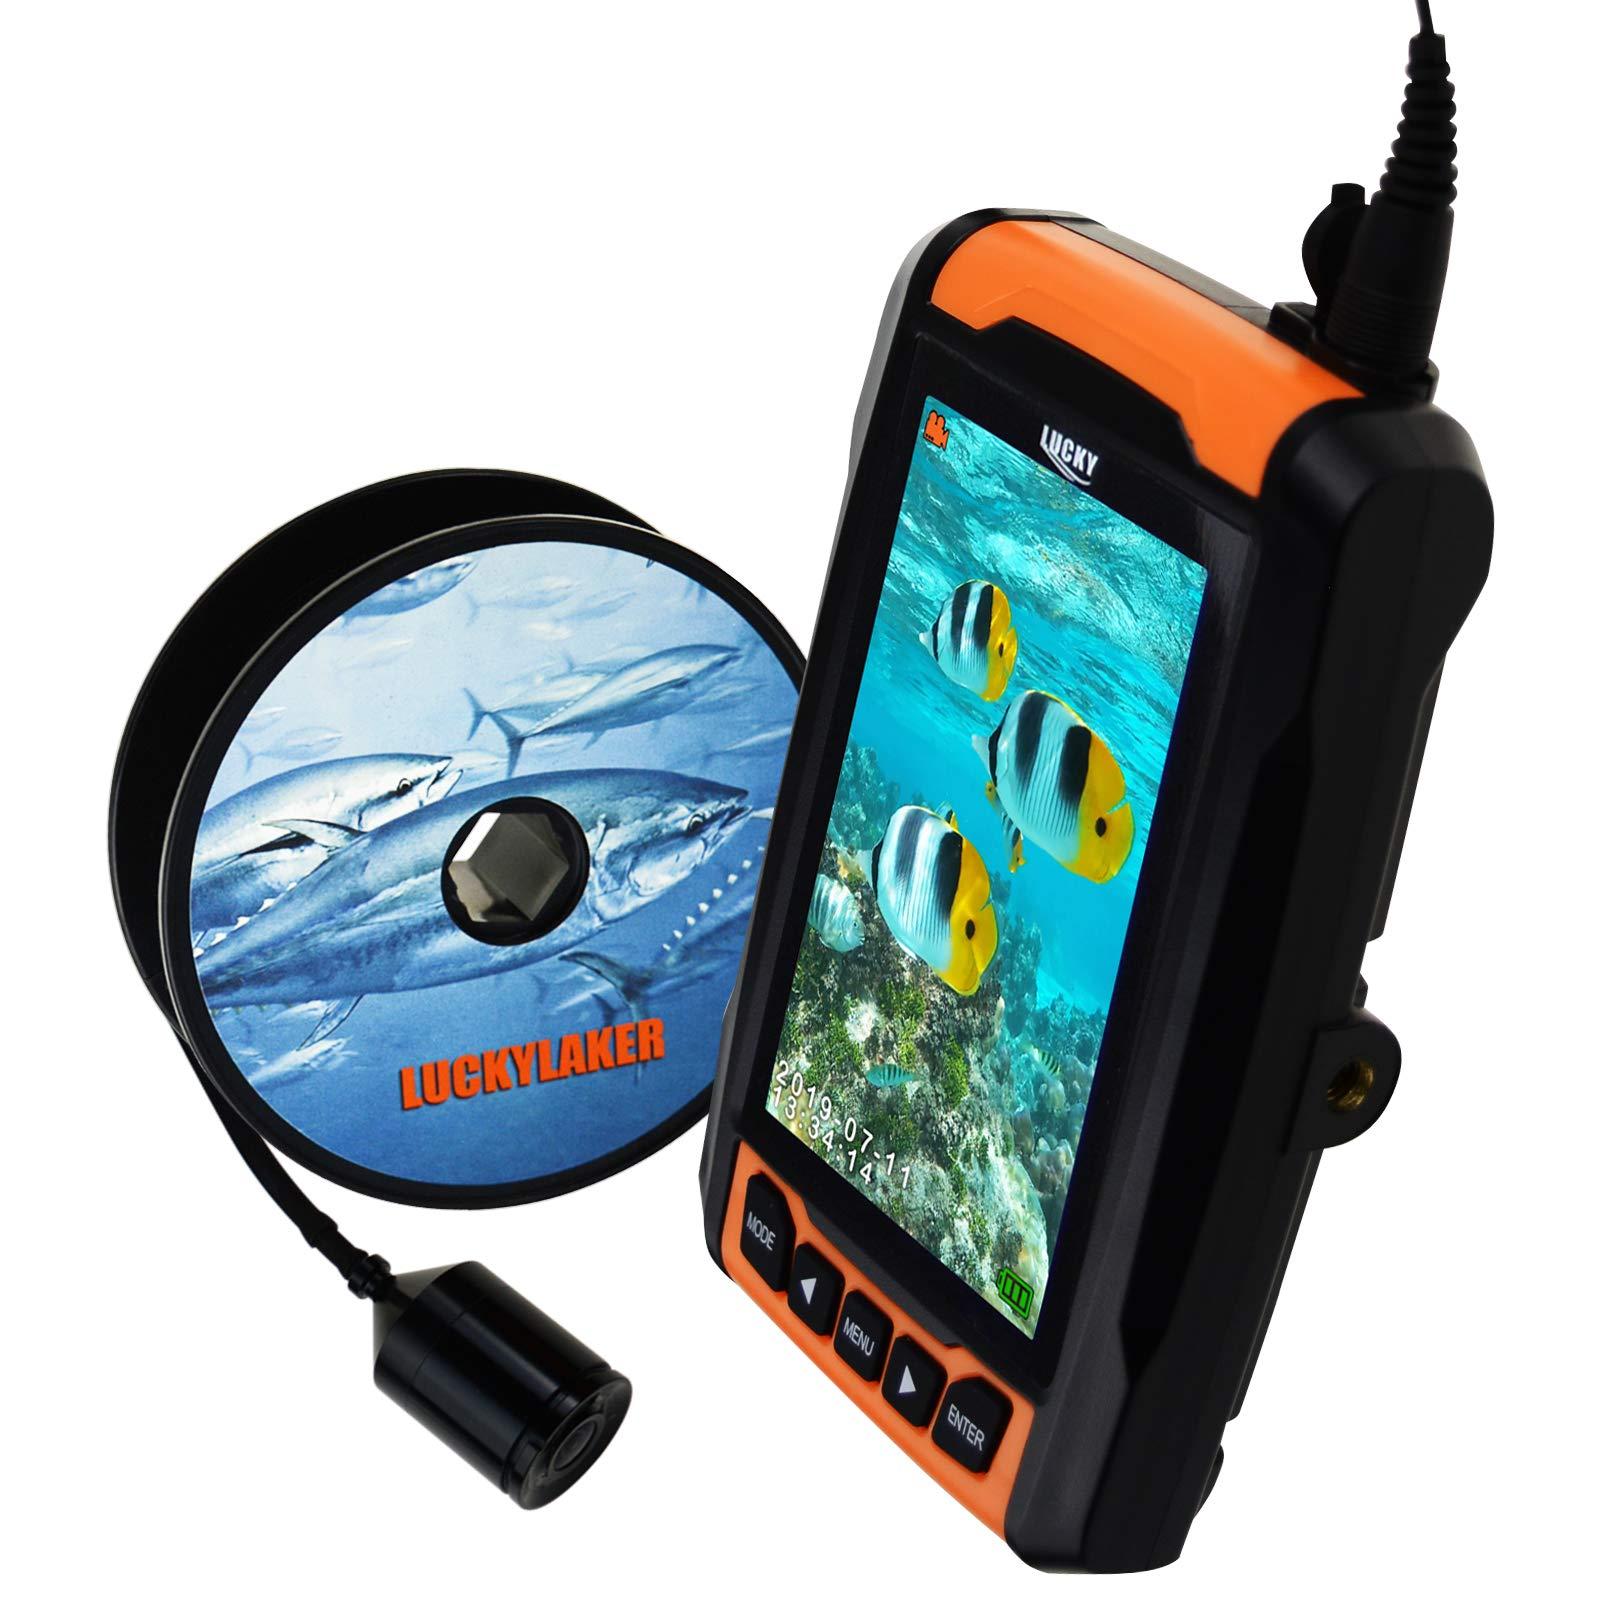 LUCKY Display Underwater Locator Rechargeable